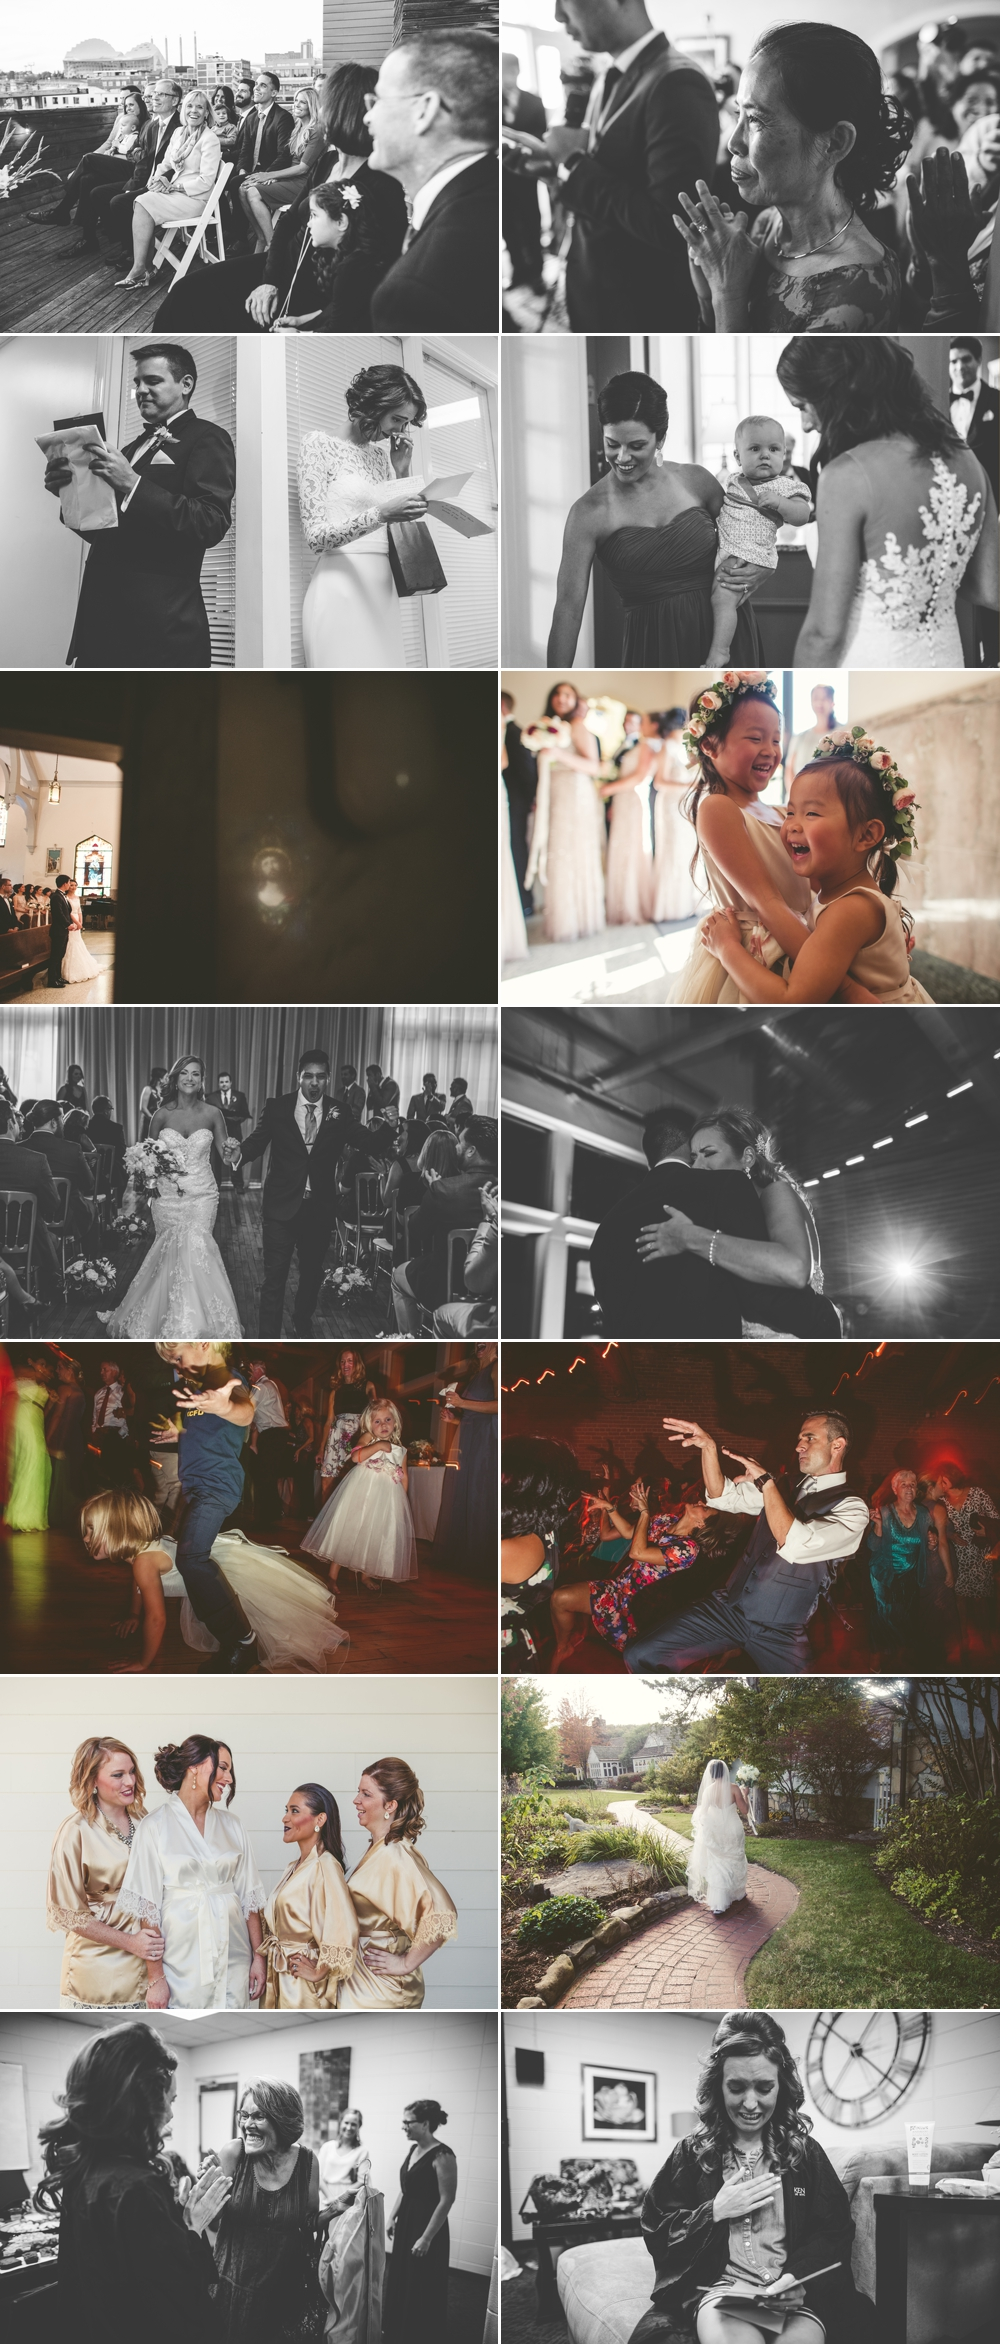 jason_domingues_photography_best_kansas_city_photography_kc_wedding_weddings0008.jpg